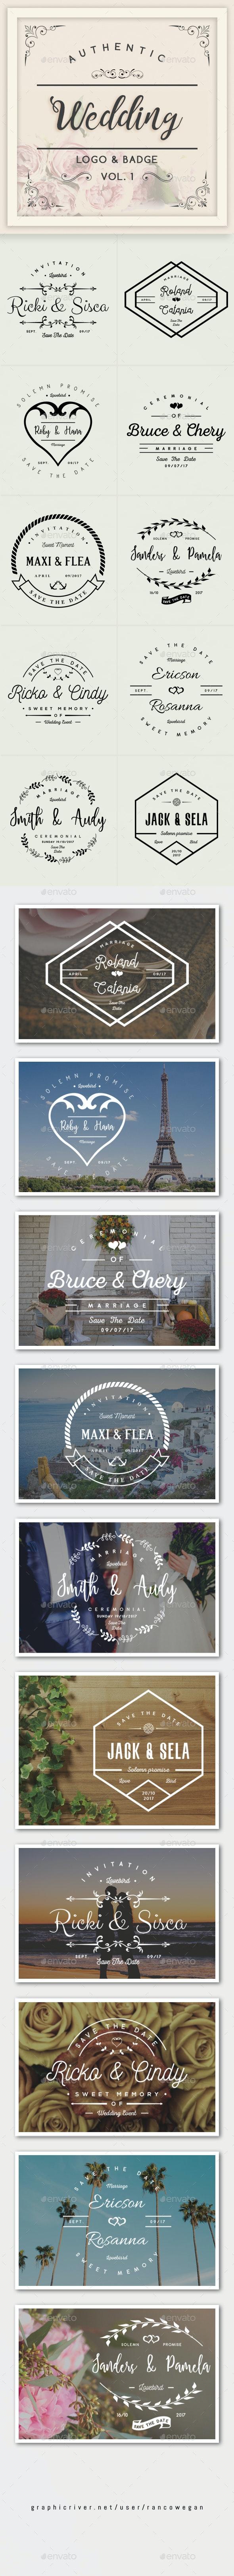 Authentic Wedding Logo & Badge - Badges & Stickers Web Elements